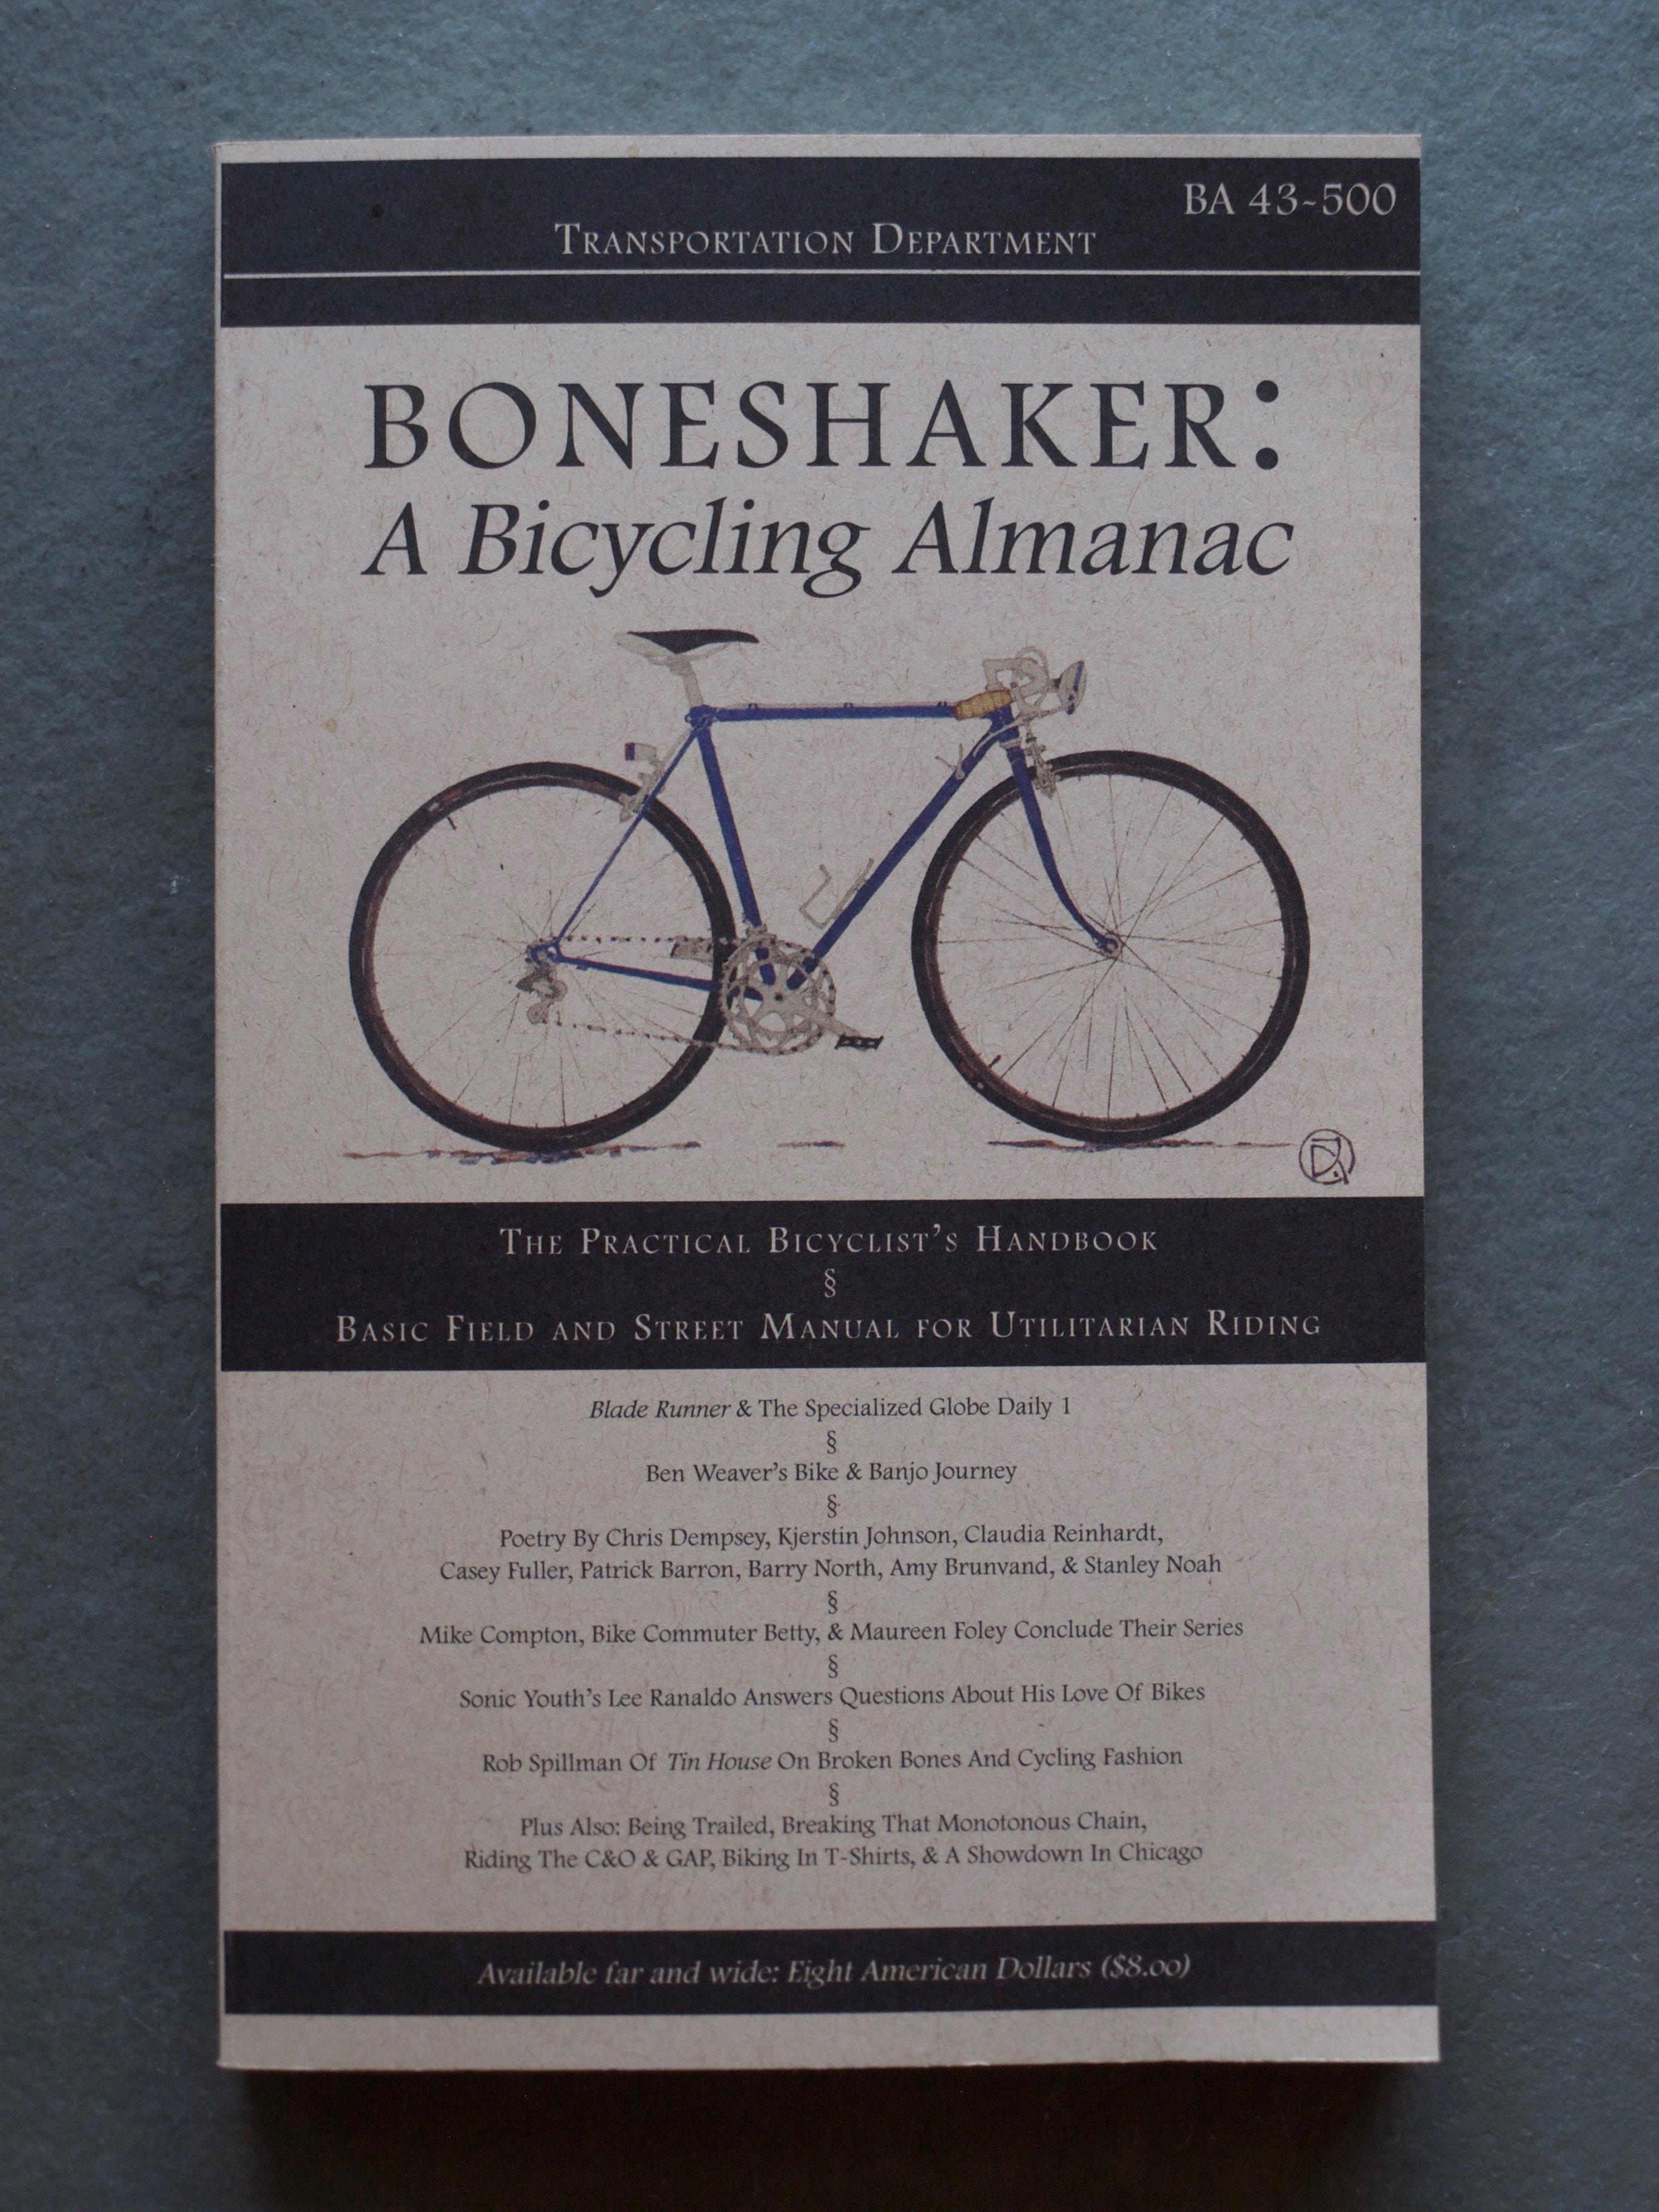 Boneshaker BA 43-500 00008